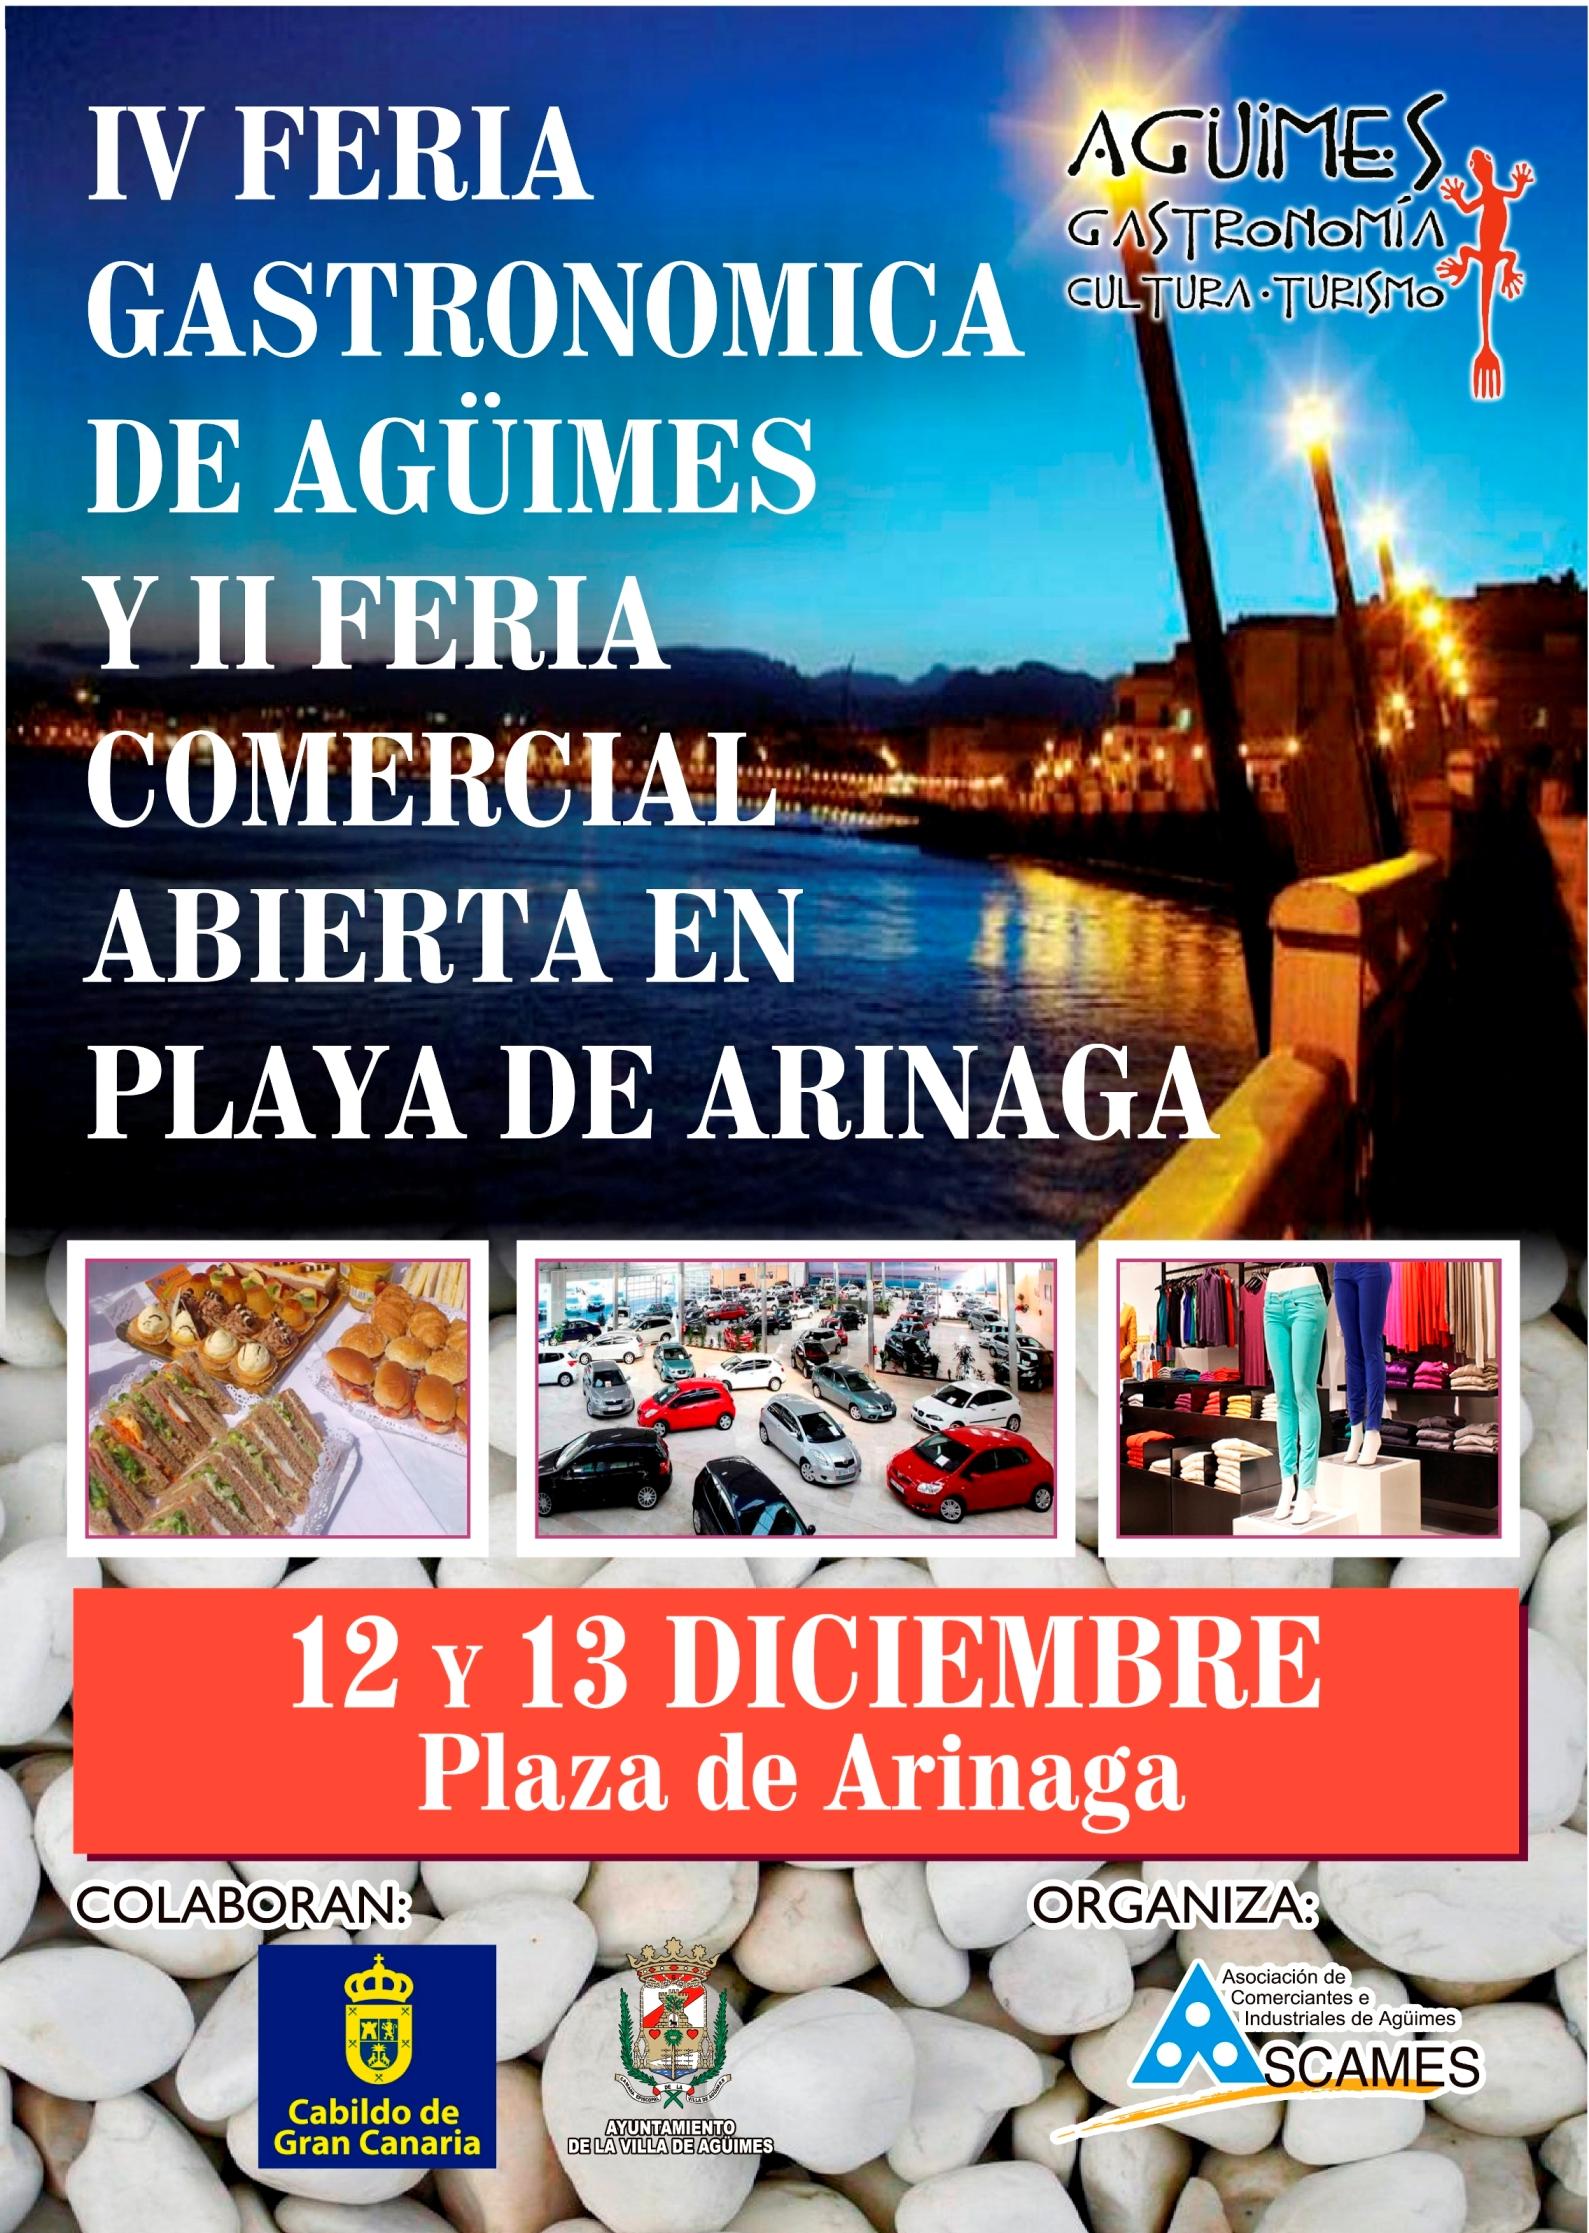 IV Feria Gatronómica de Agüimes y II Feria Comercial Abierta de Arinaga